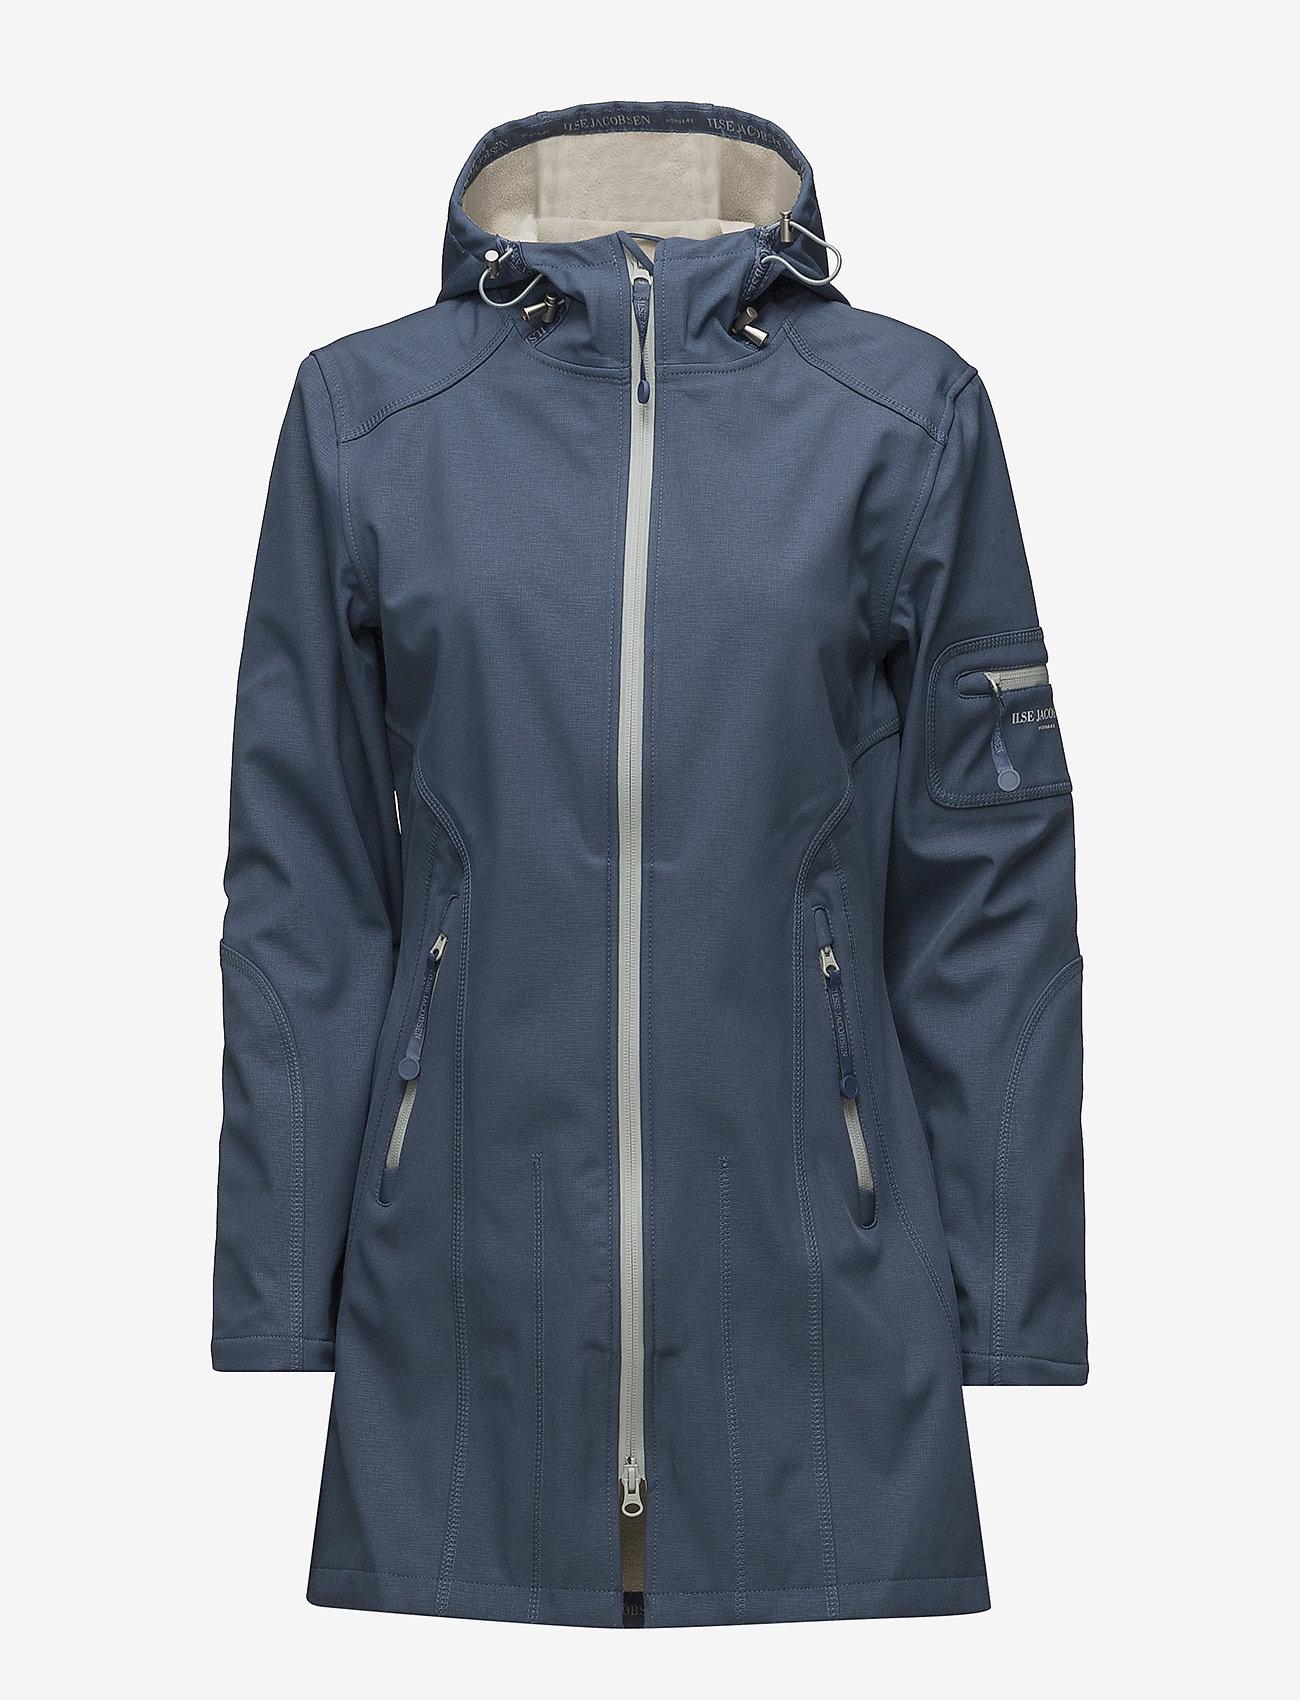 Ilse Jacobsen - RAIN07B - rainwear - 691151 blue rock - 1